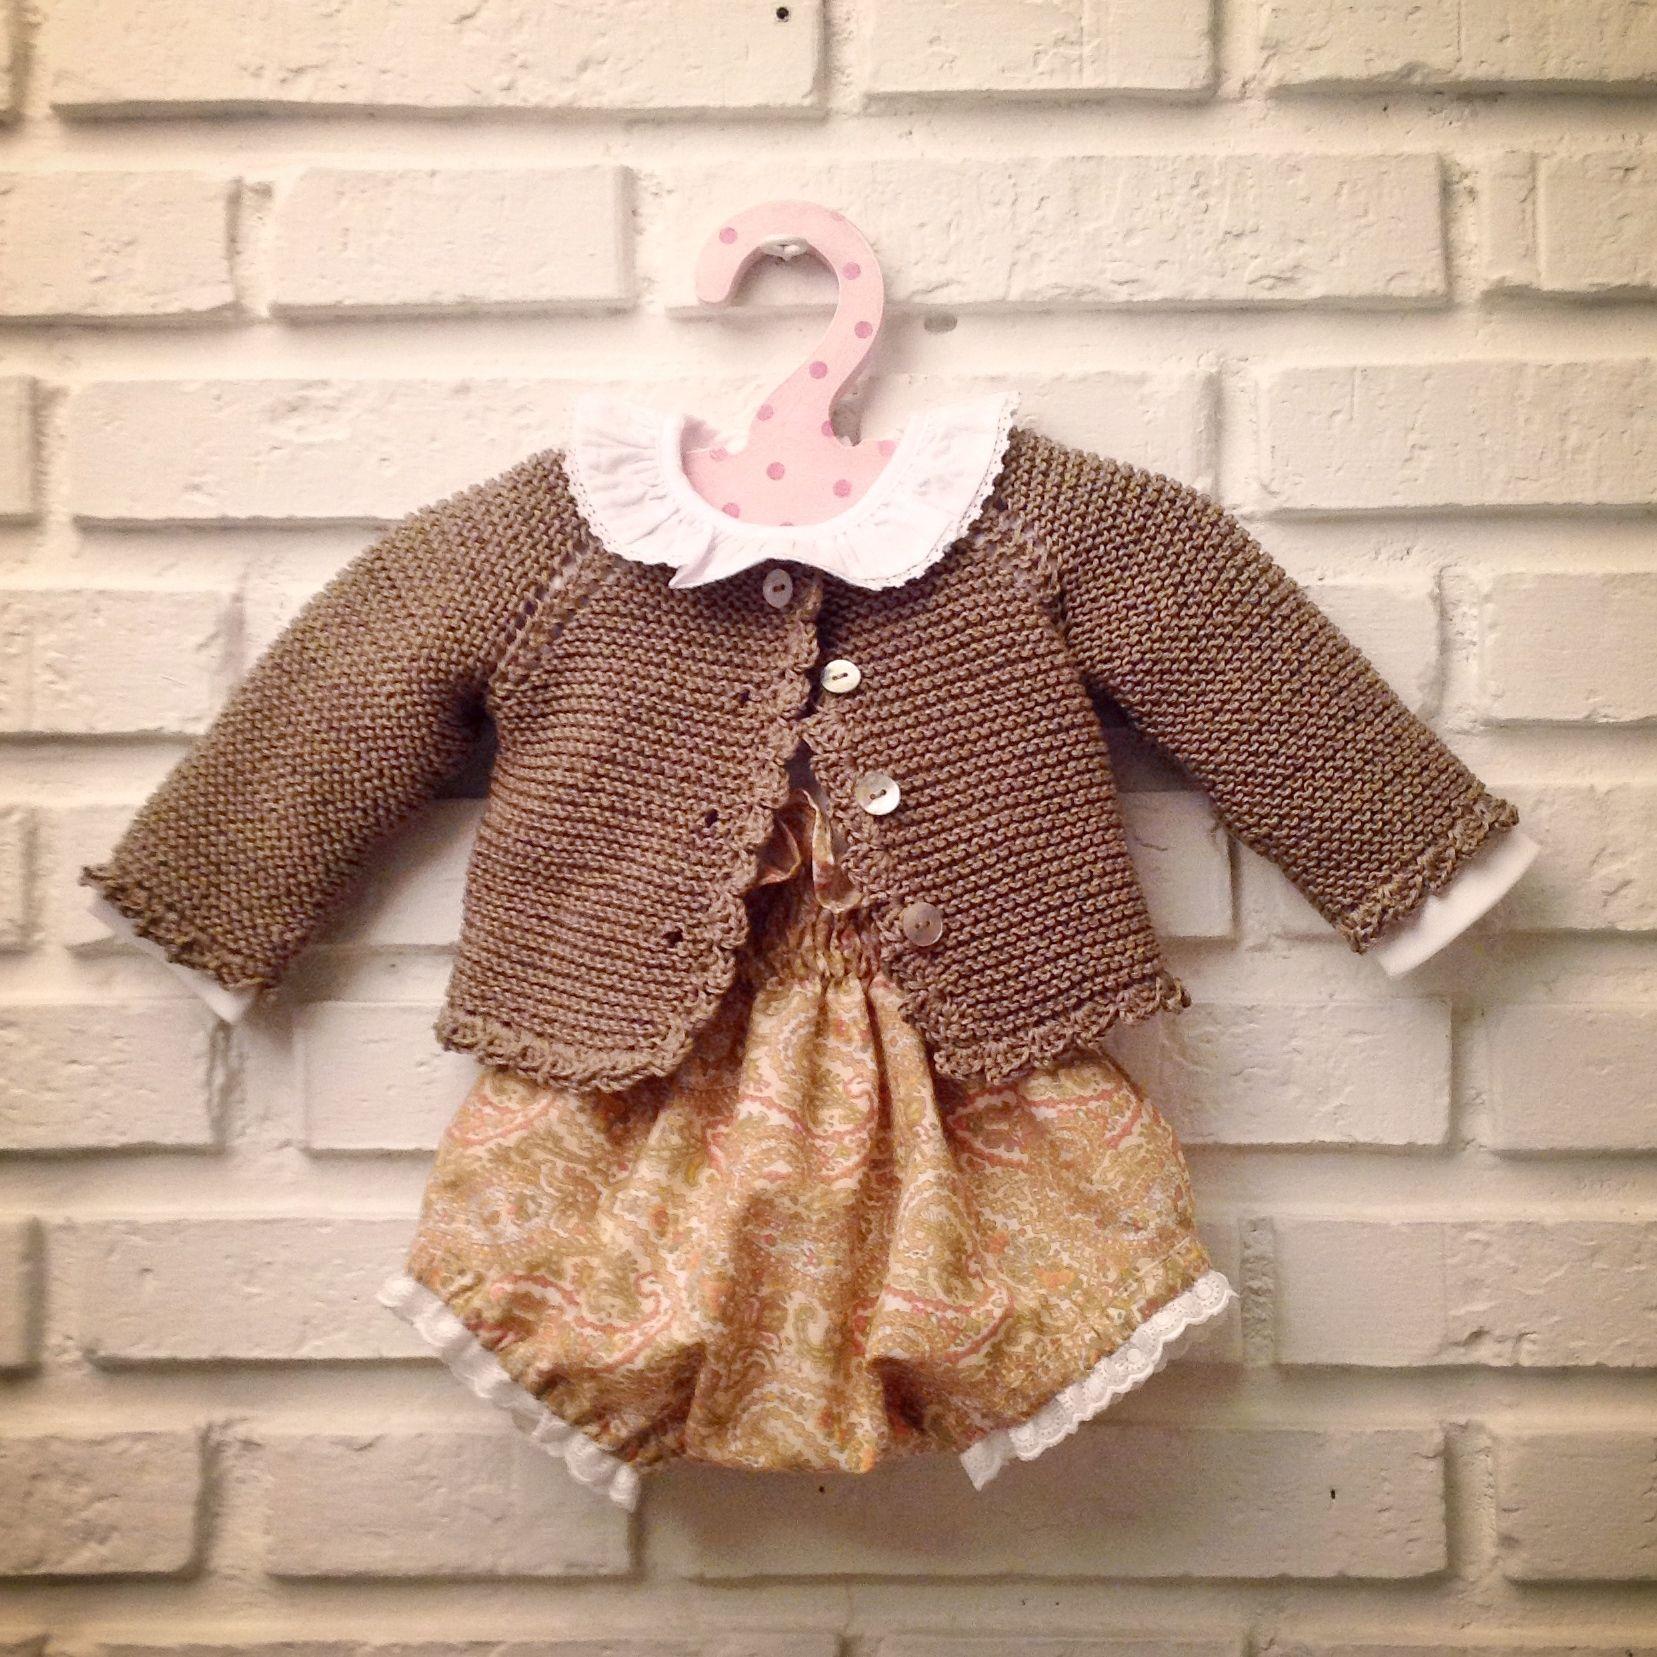 pelote de laine culotte y chaqueta para bebe pelotedelainebebes pelote de laine. Black Bedroom Furniture Sets. Home Design Ideas